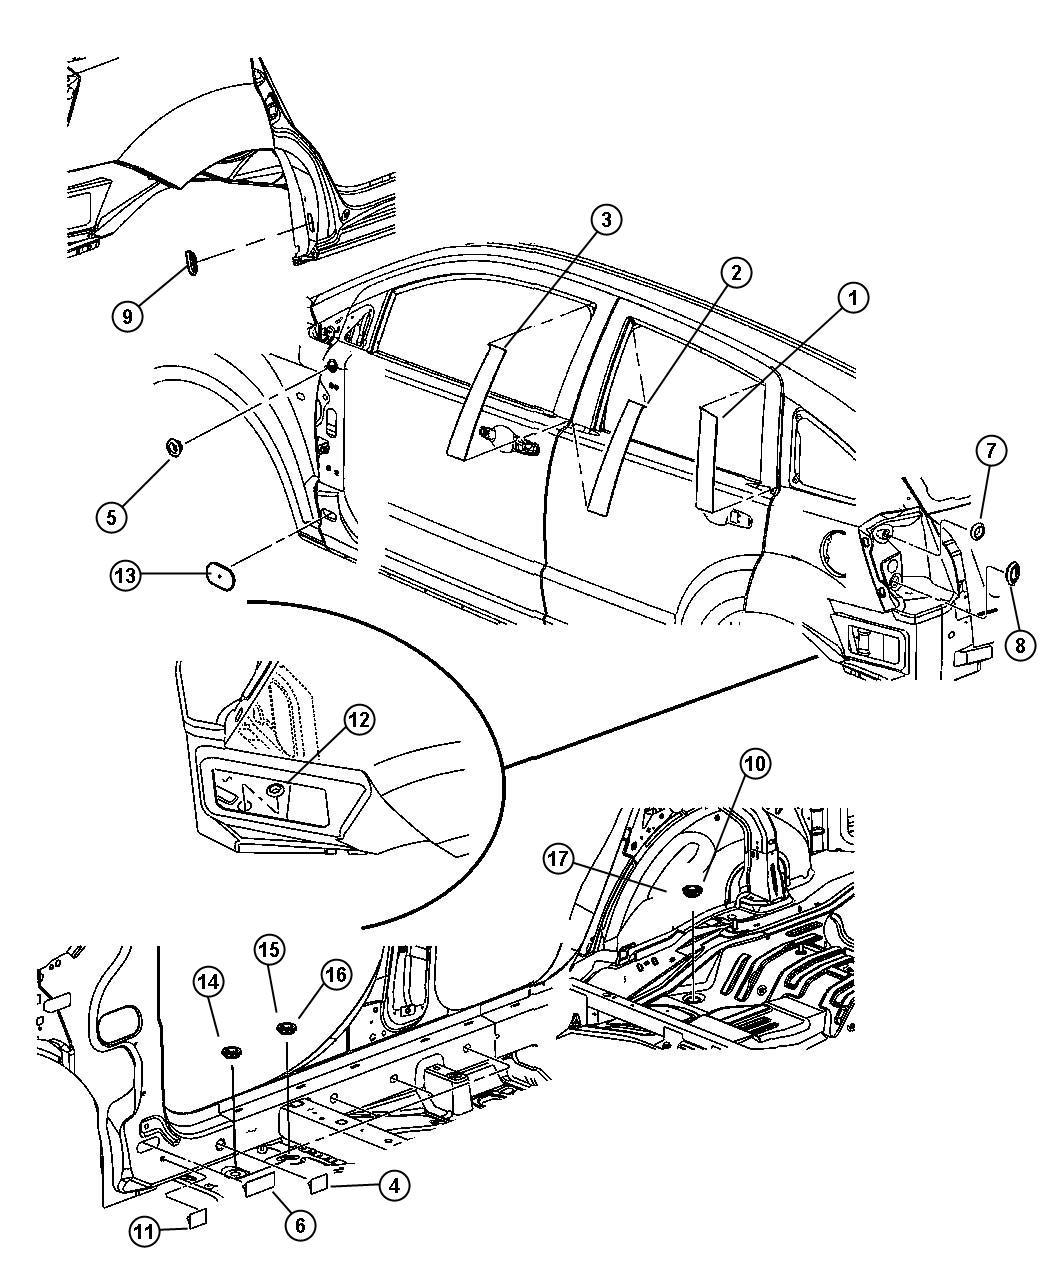 2004 dodge neon sxt stereo wiring diagram tail light 1996 chevy truck parts 2007 caliber imageresizertool com